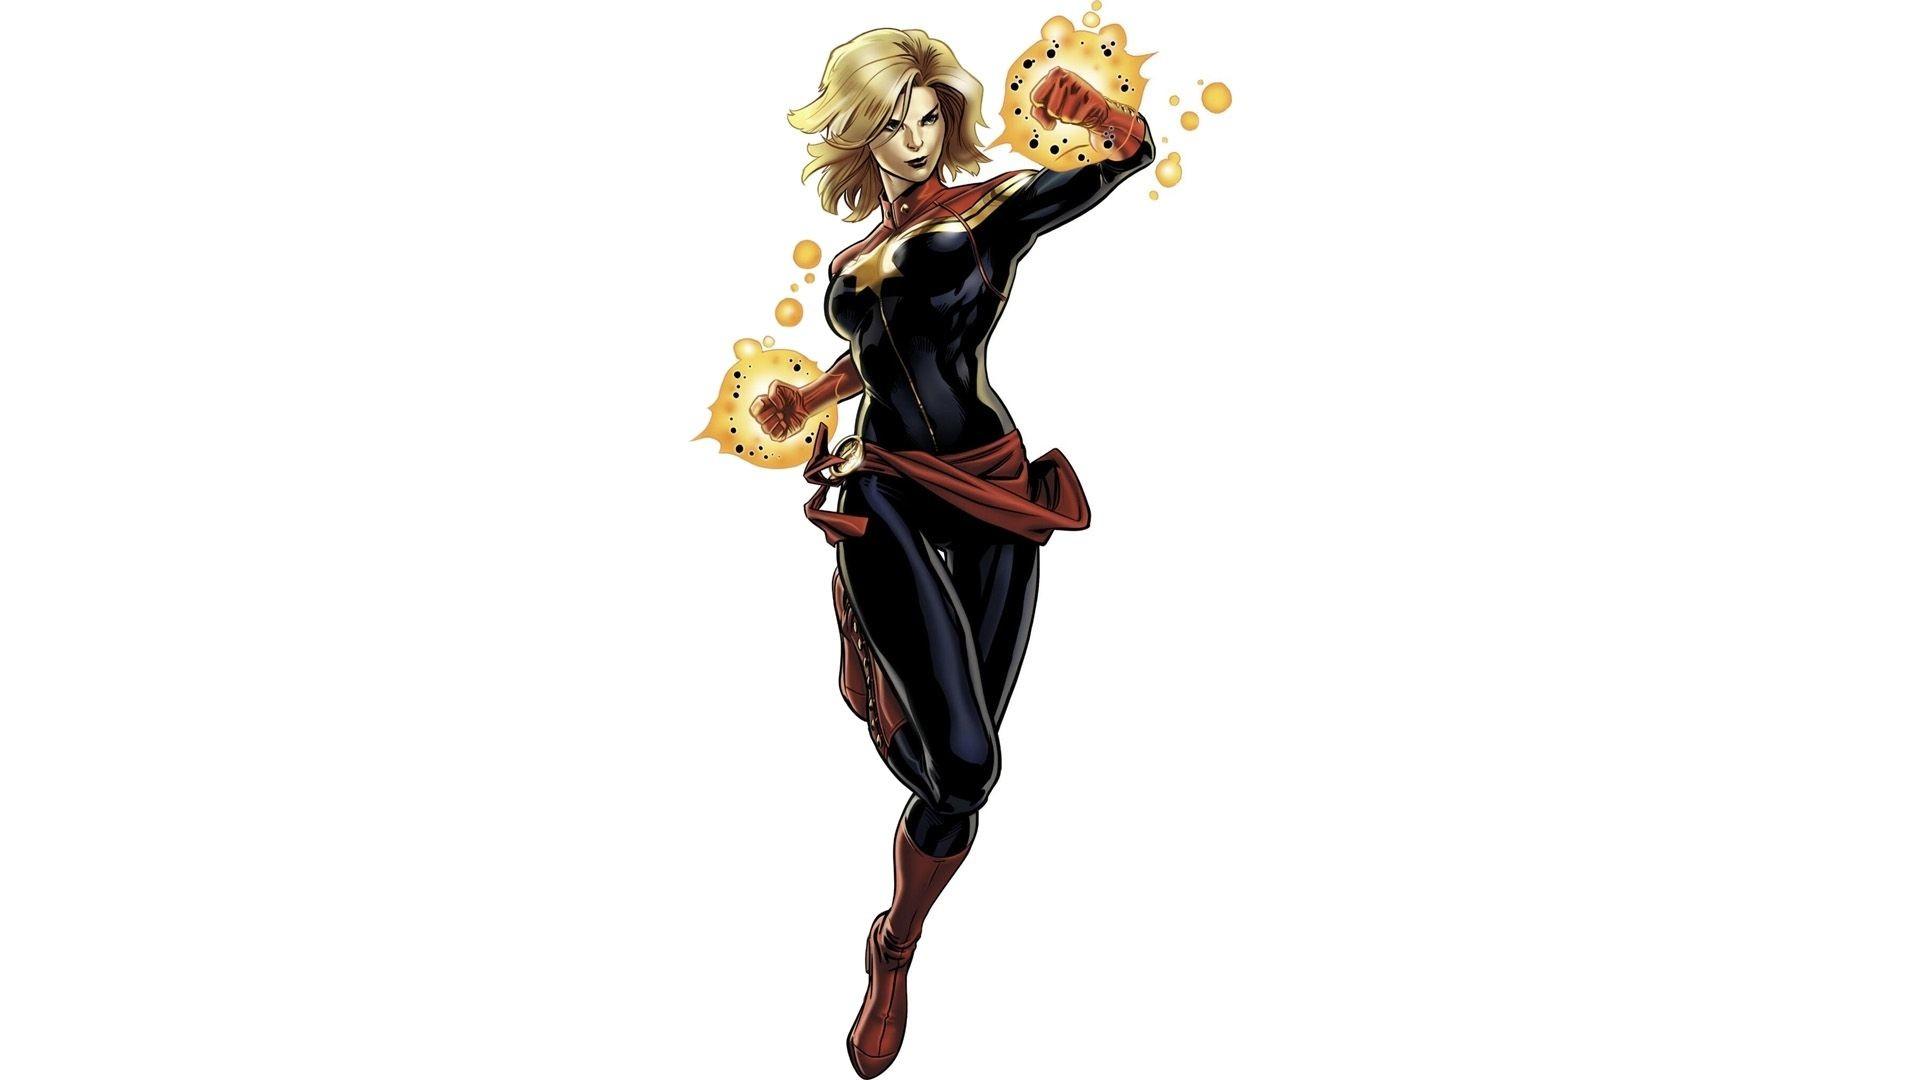 Ảnh Captain Marvel đẹp nhất